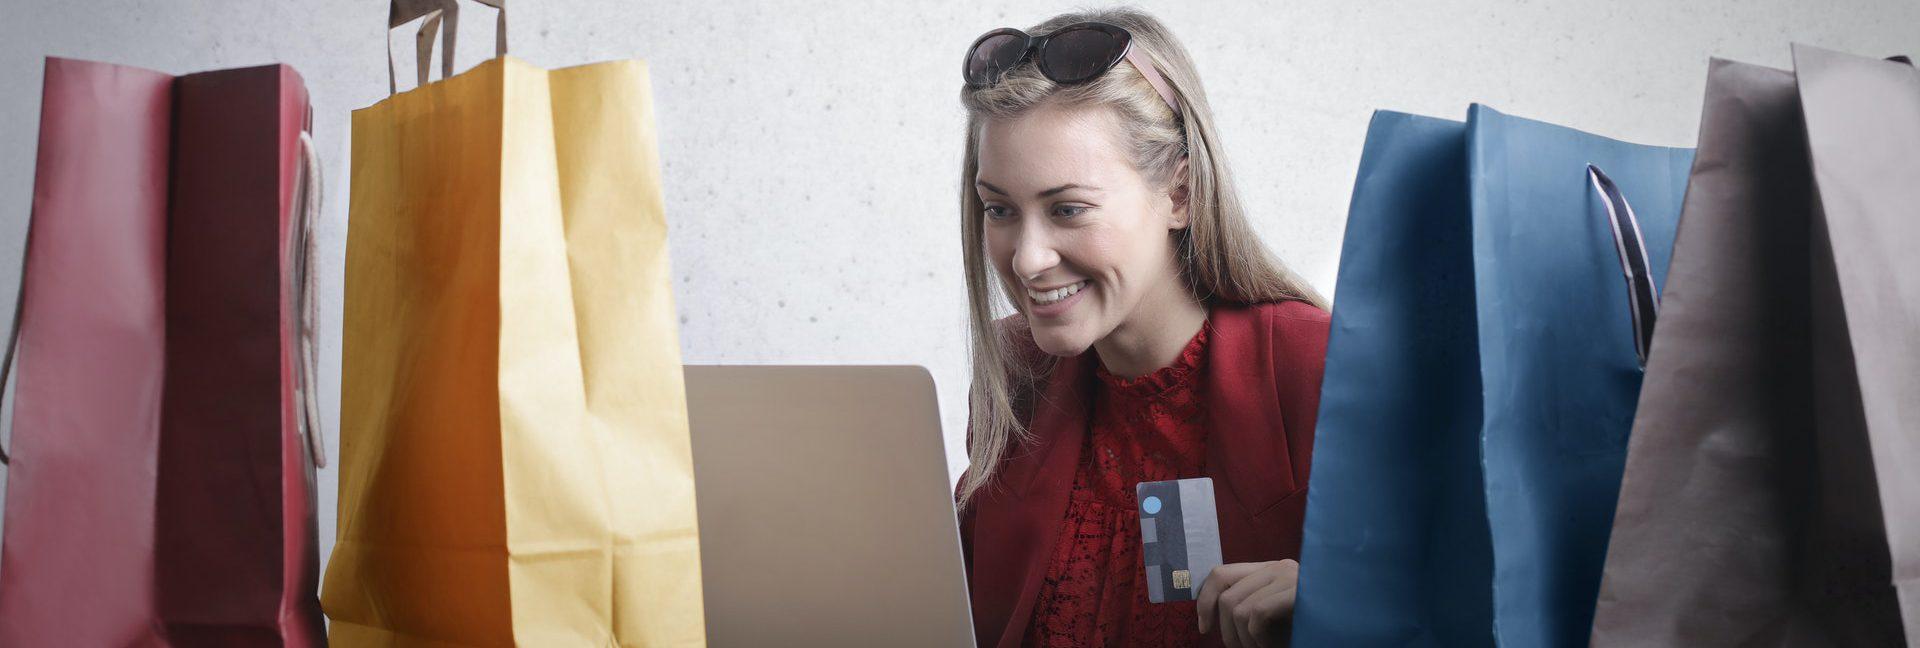 buyer persona digital